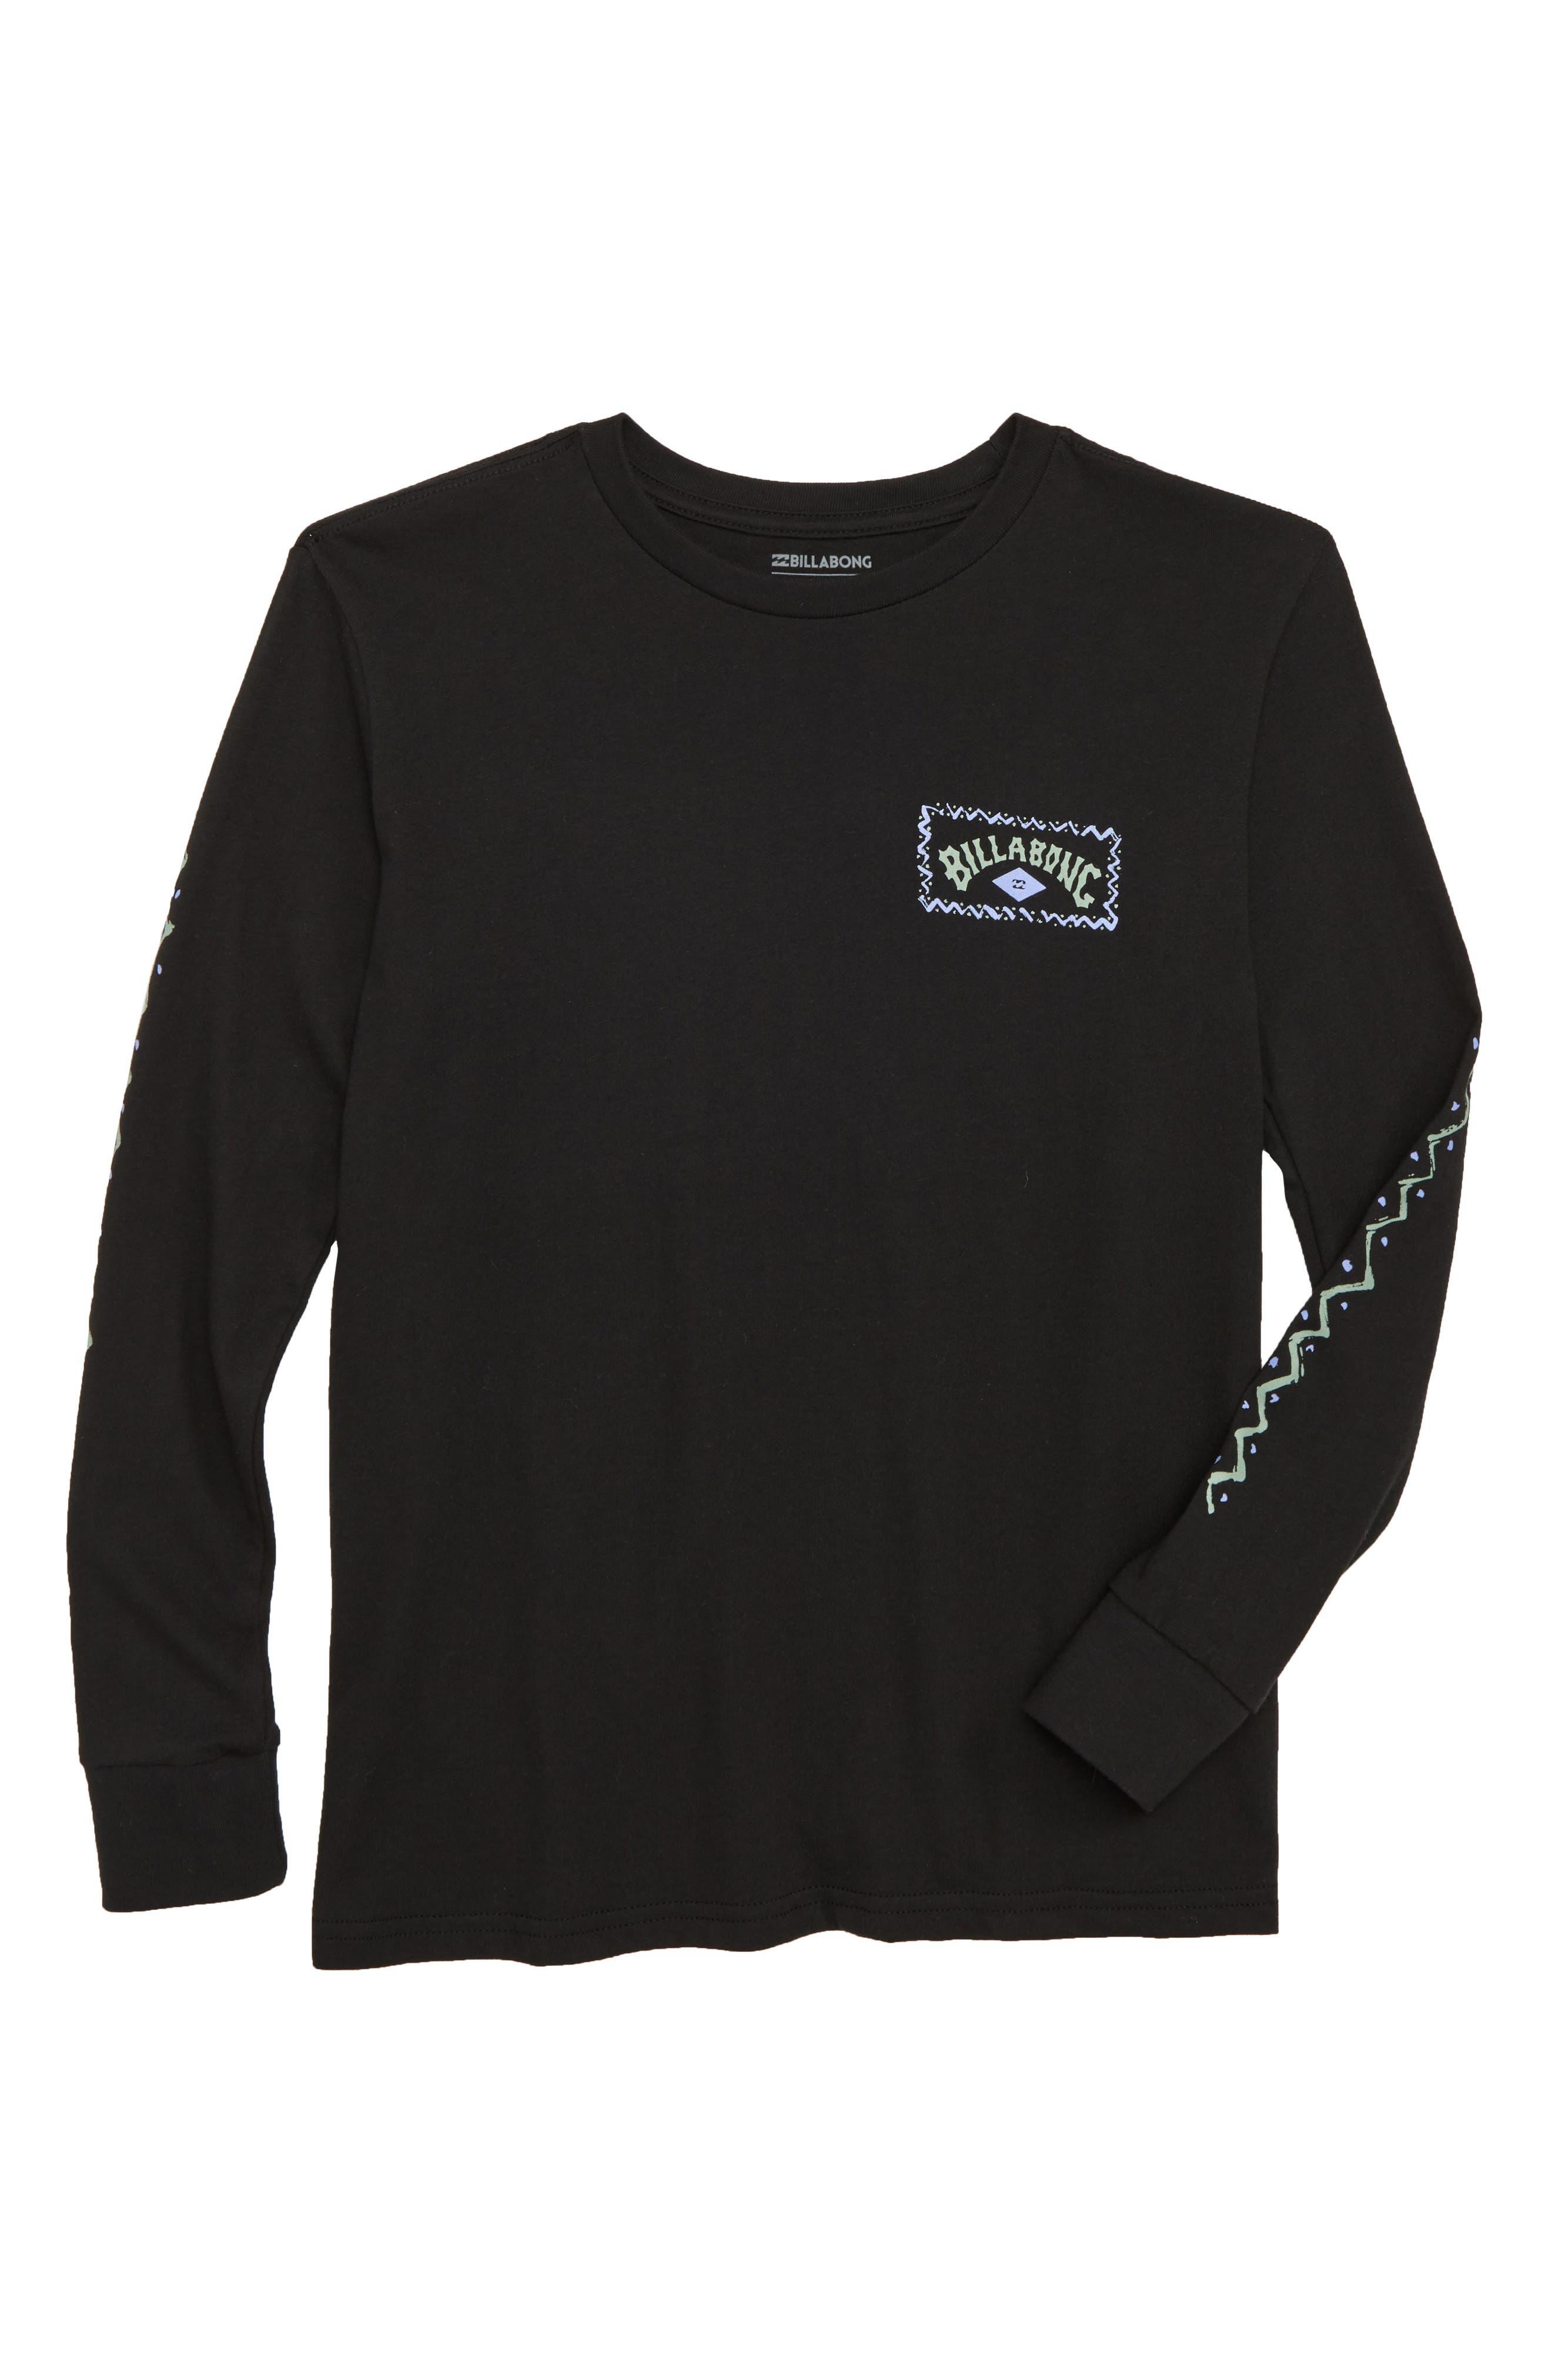 Dreamscape T-Shirt,                         Main,                         color, Black